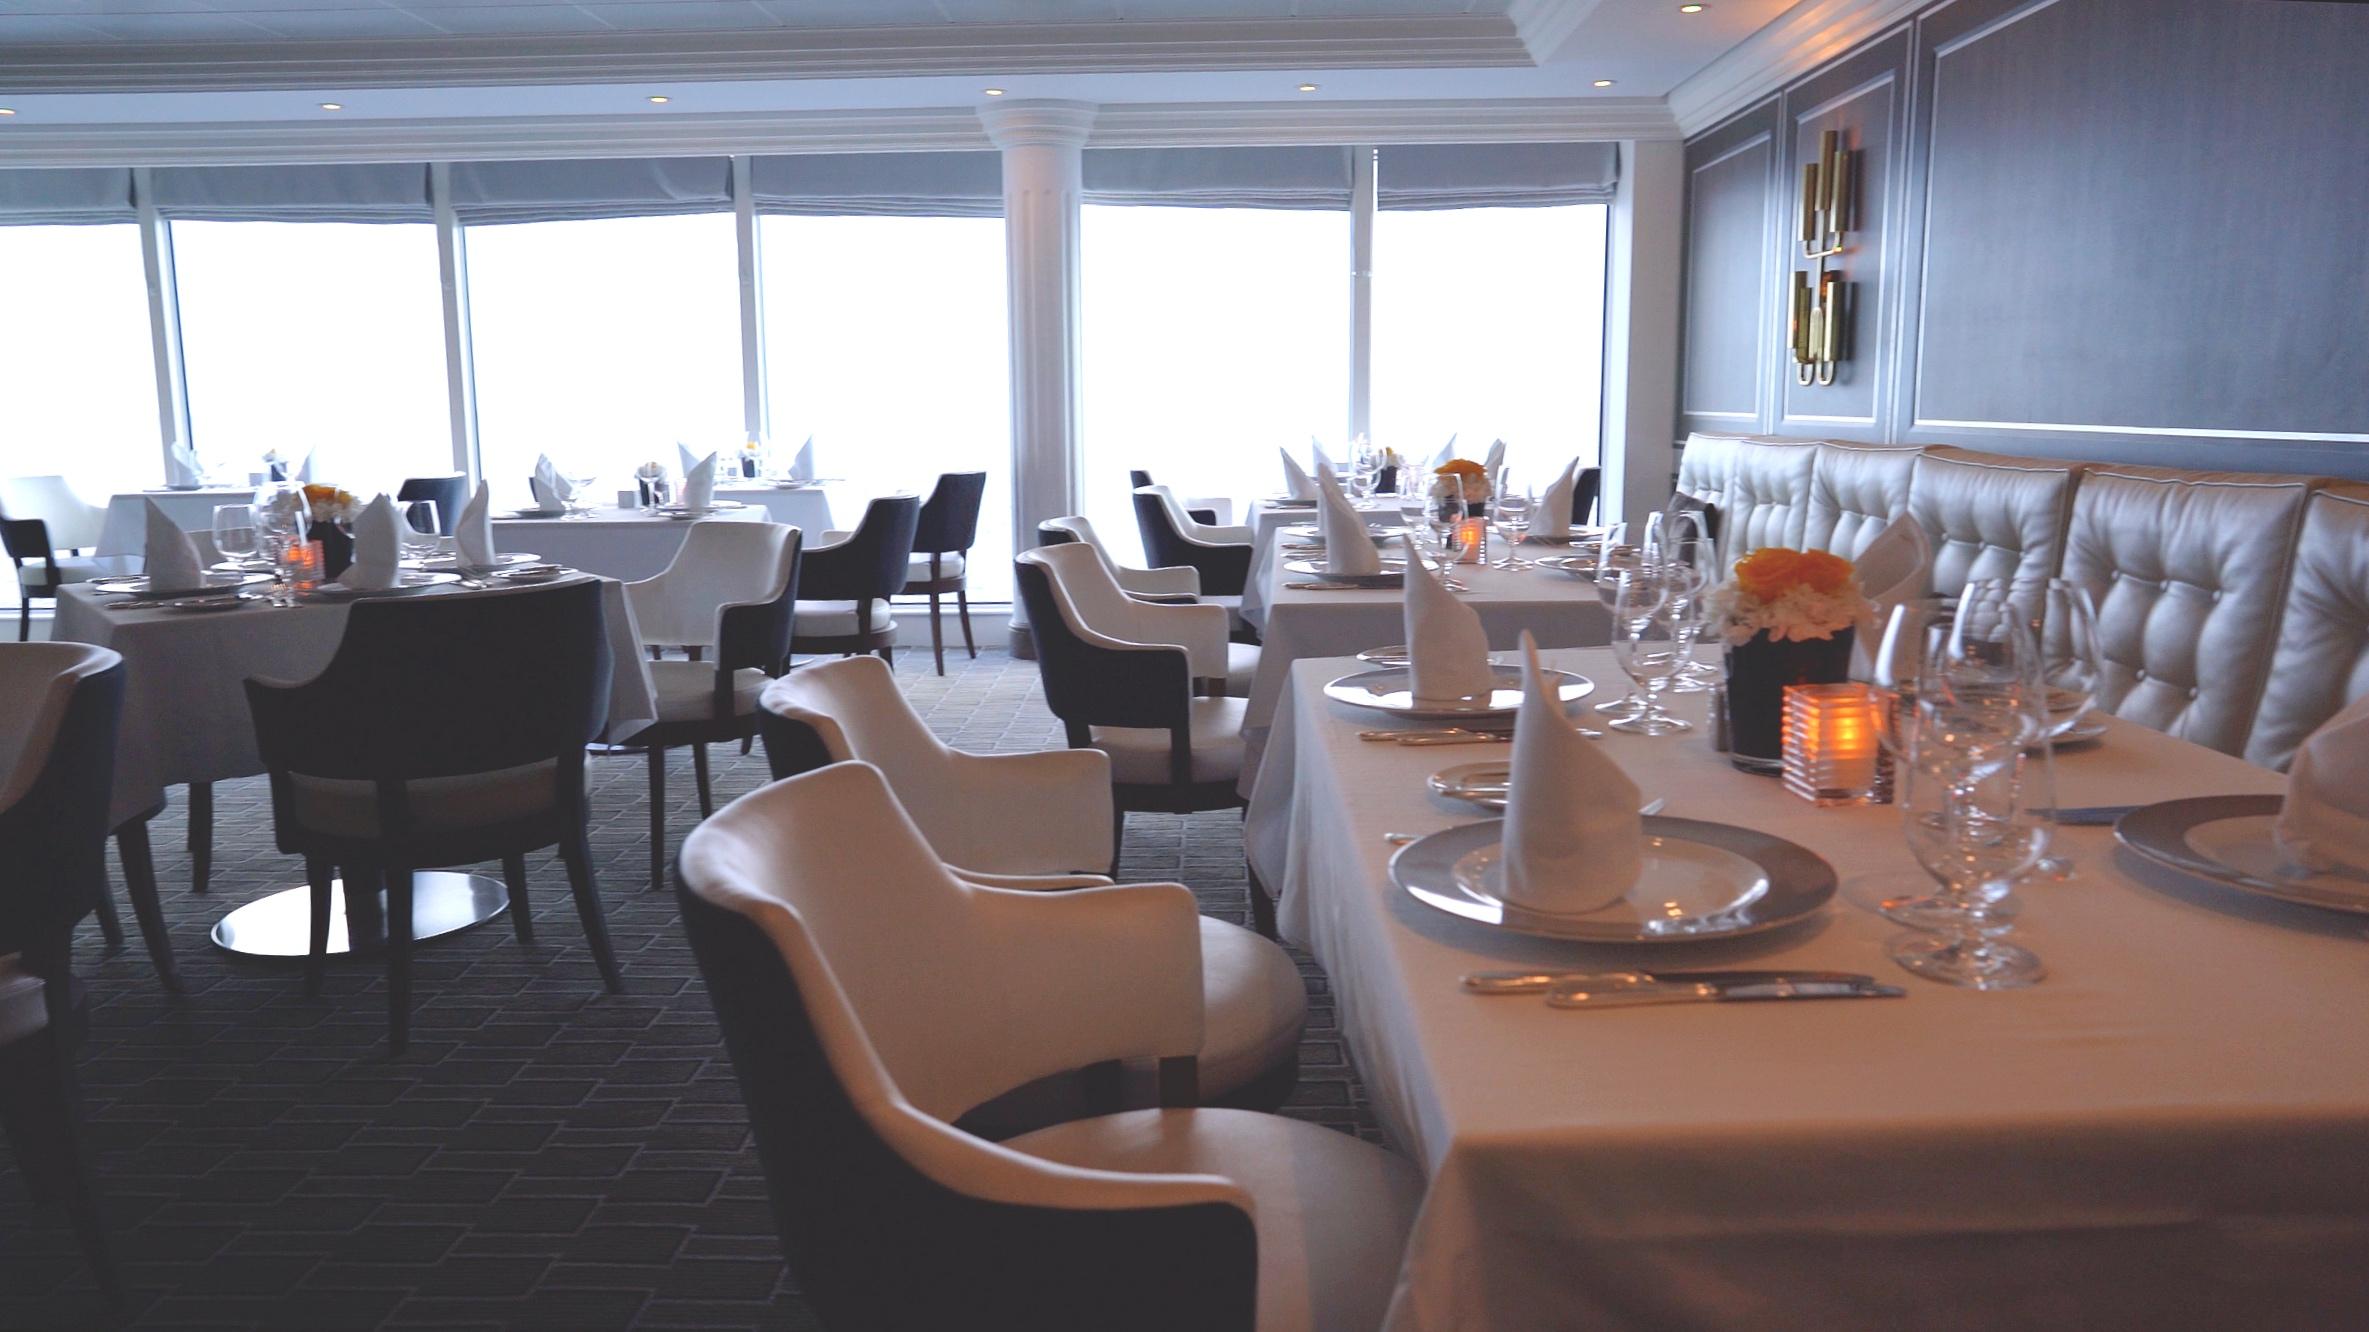 The beautiful Aqualina restaurant